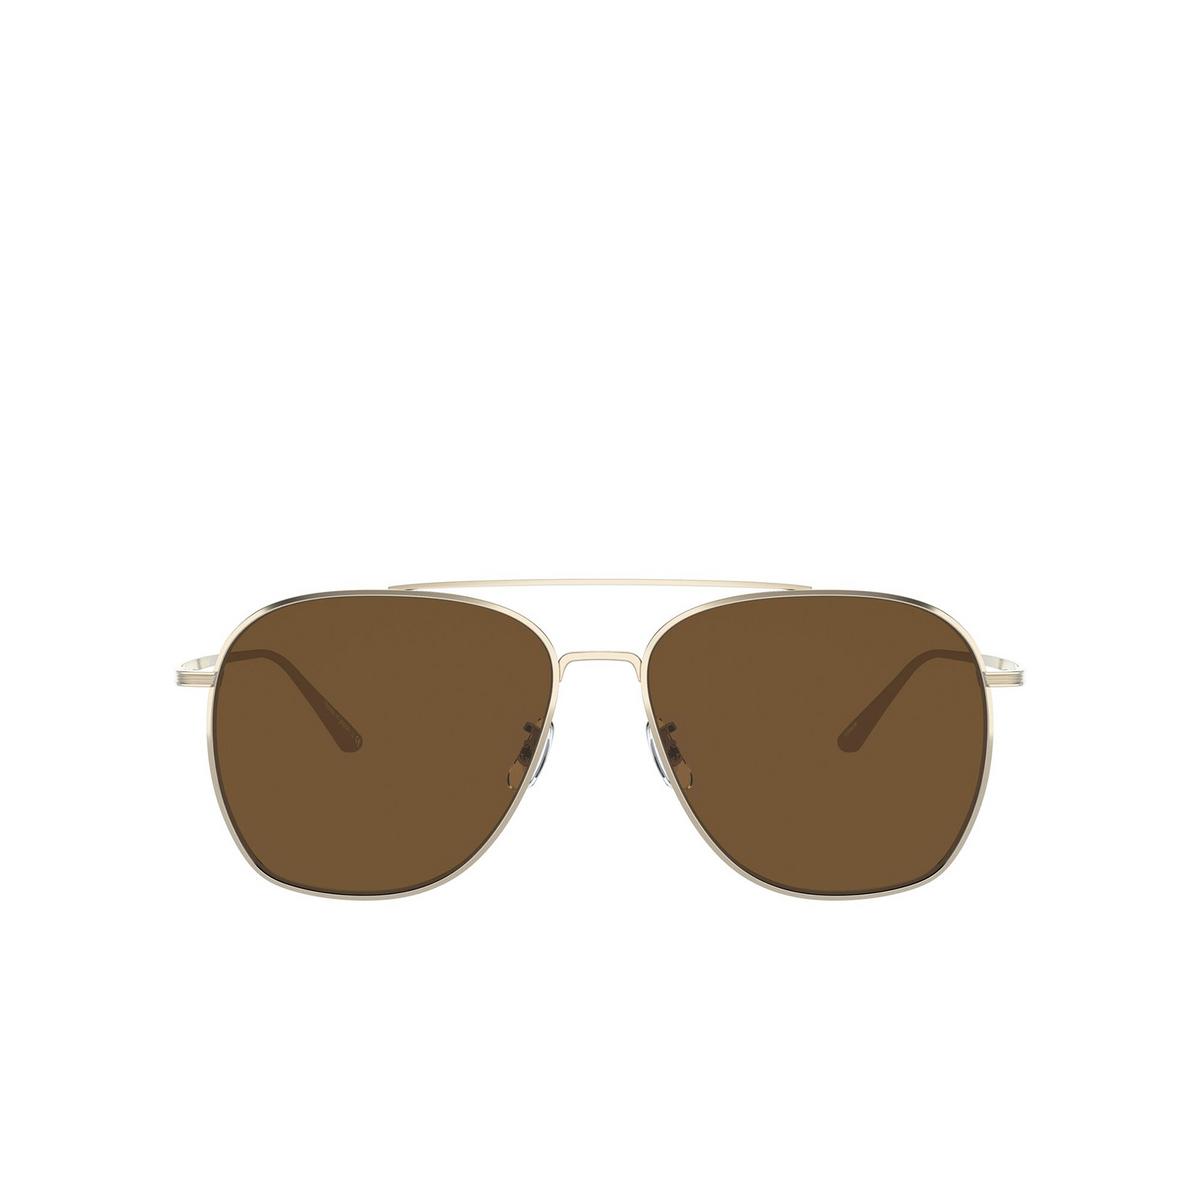 Oliver Peoples® Aviator Sunglasses: Ellerston OV1278ST color Gold 529257 - front view.